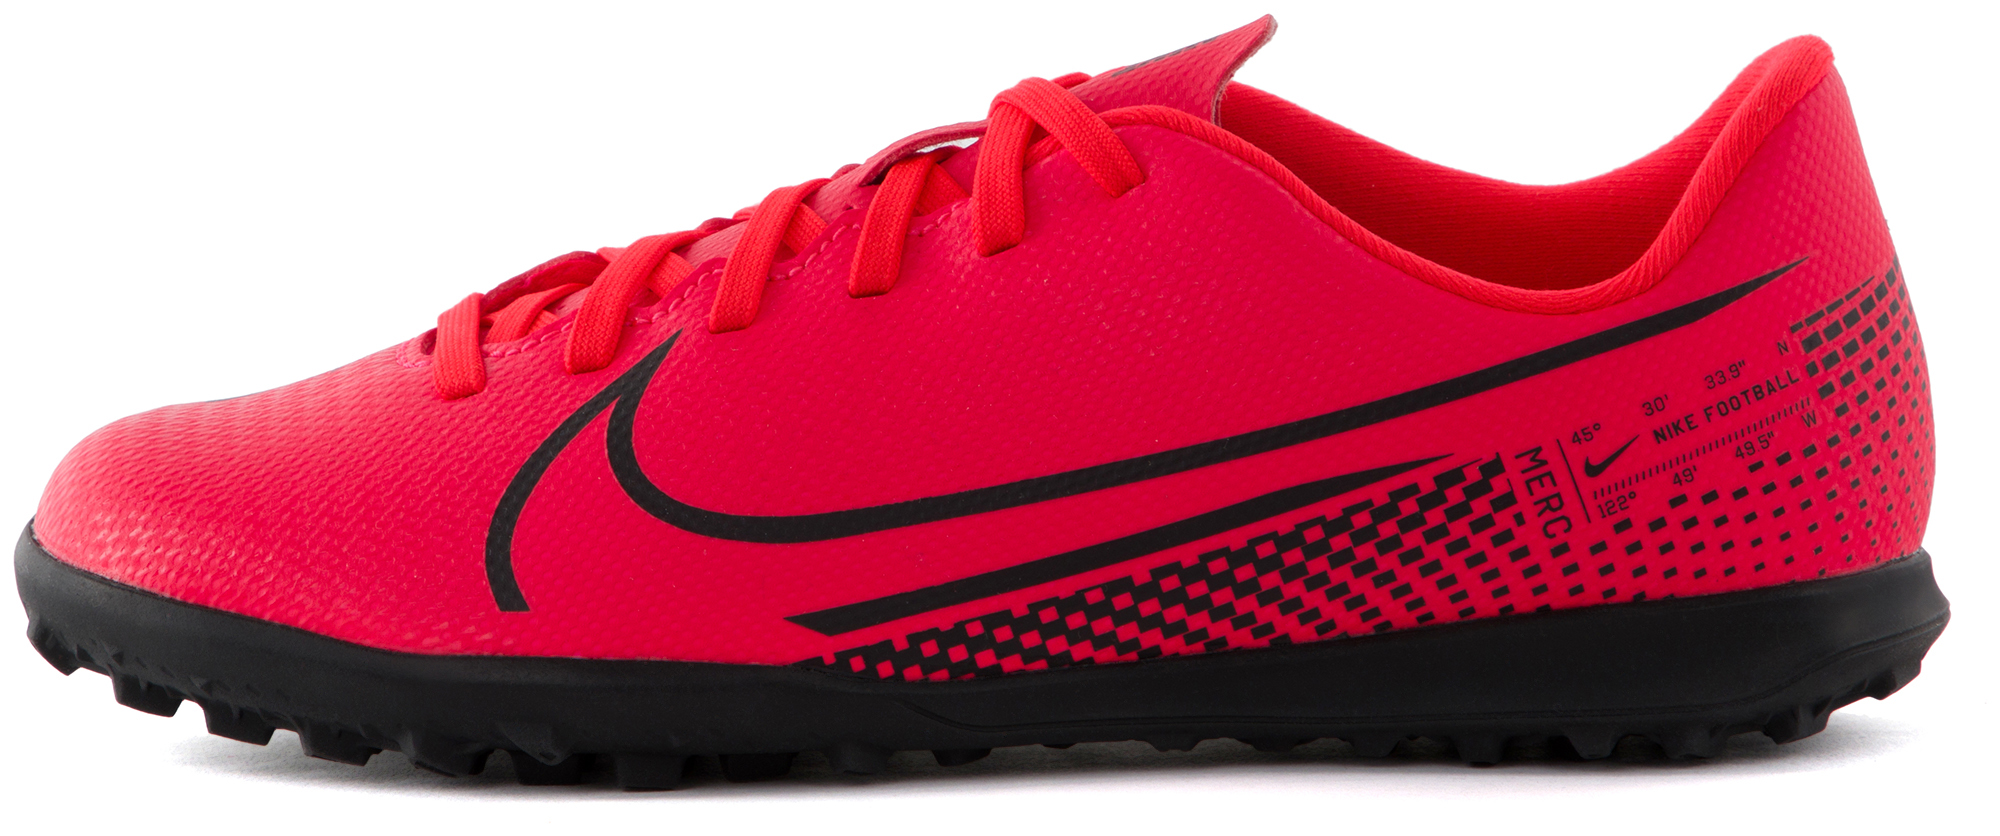 цена Nike Бутсы для мальчиков Nike Vapor 13 Club TF, размер 33 онлайн в 2017 году